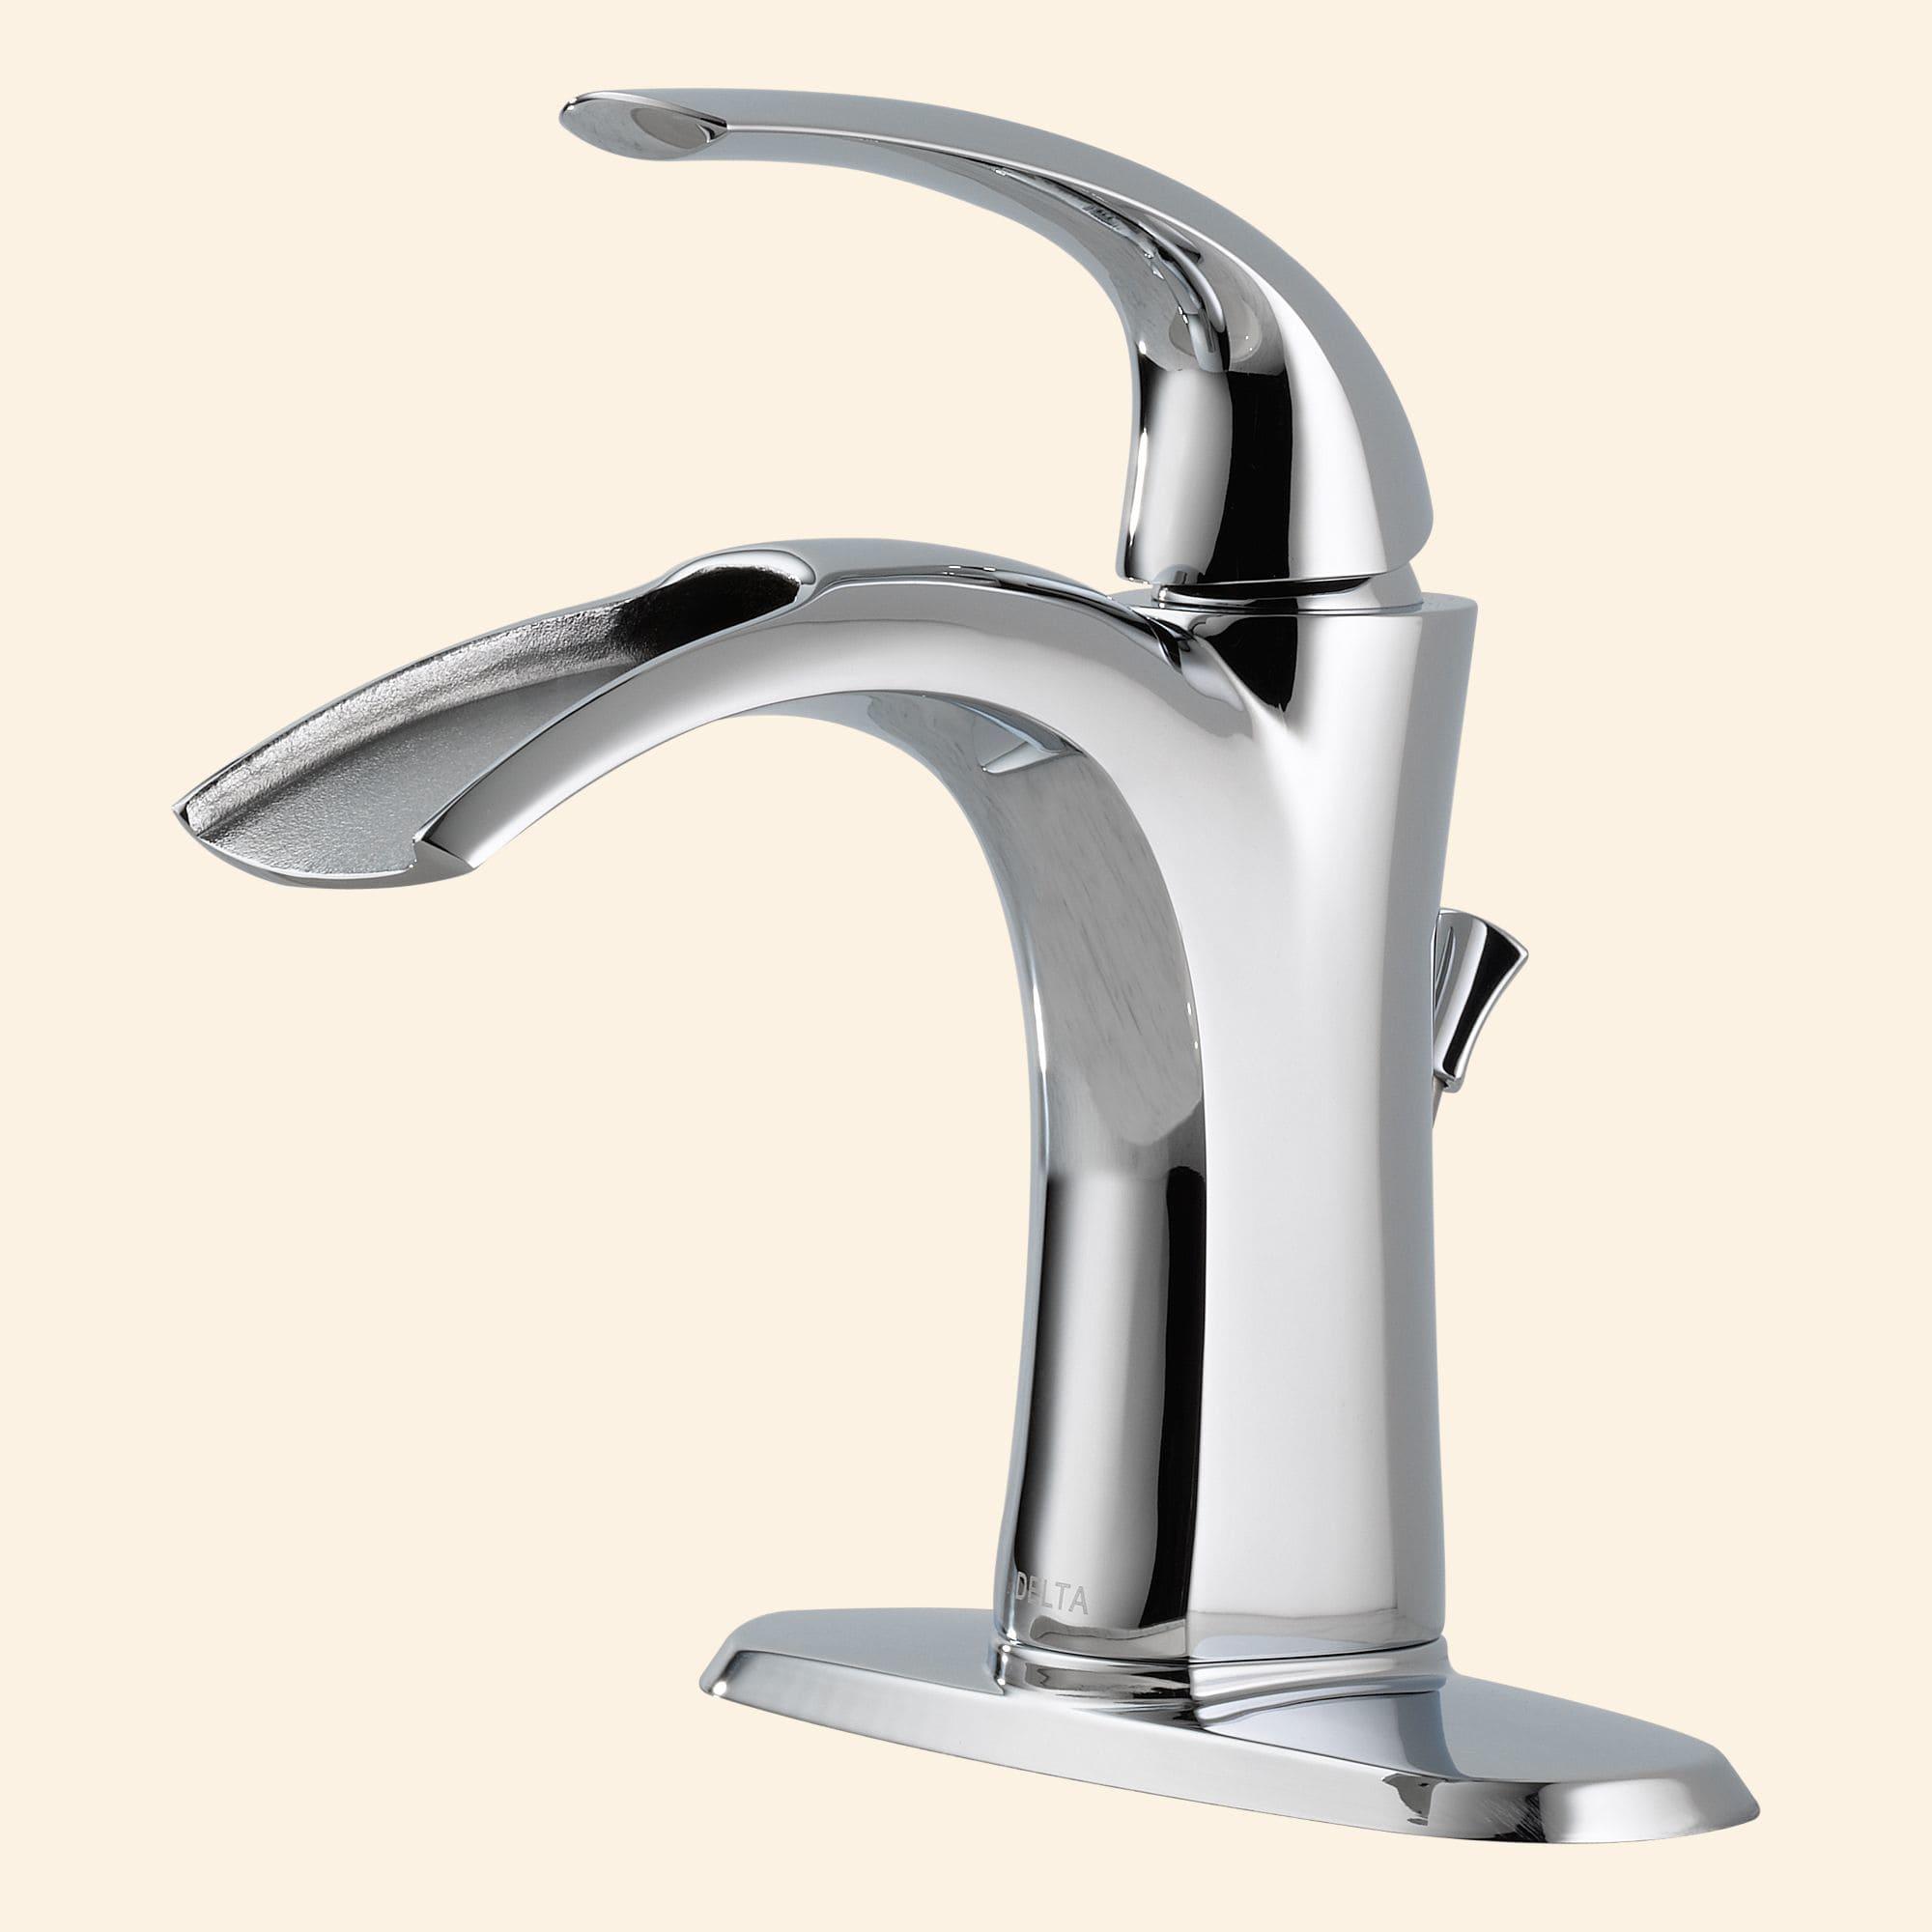 Delta Bathroom Sink Faucets 100 Aqua Touch Kitchen Faucet